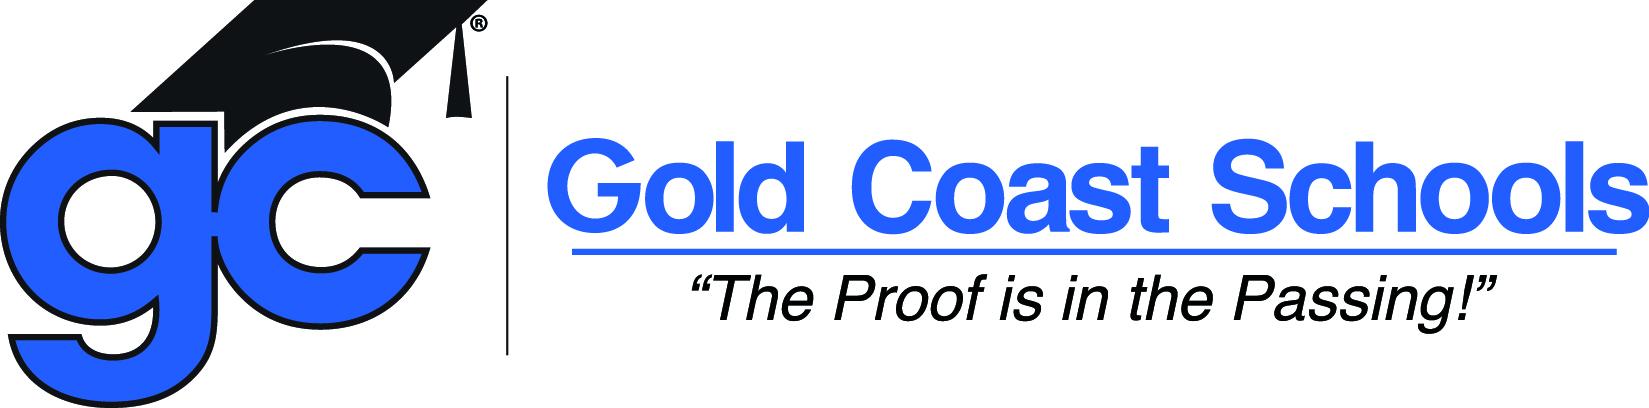 GC Proof--300dpi